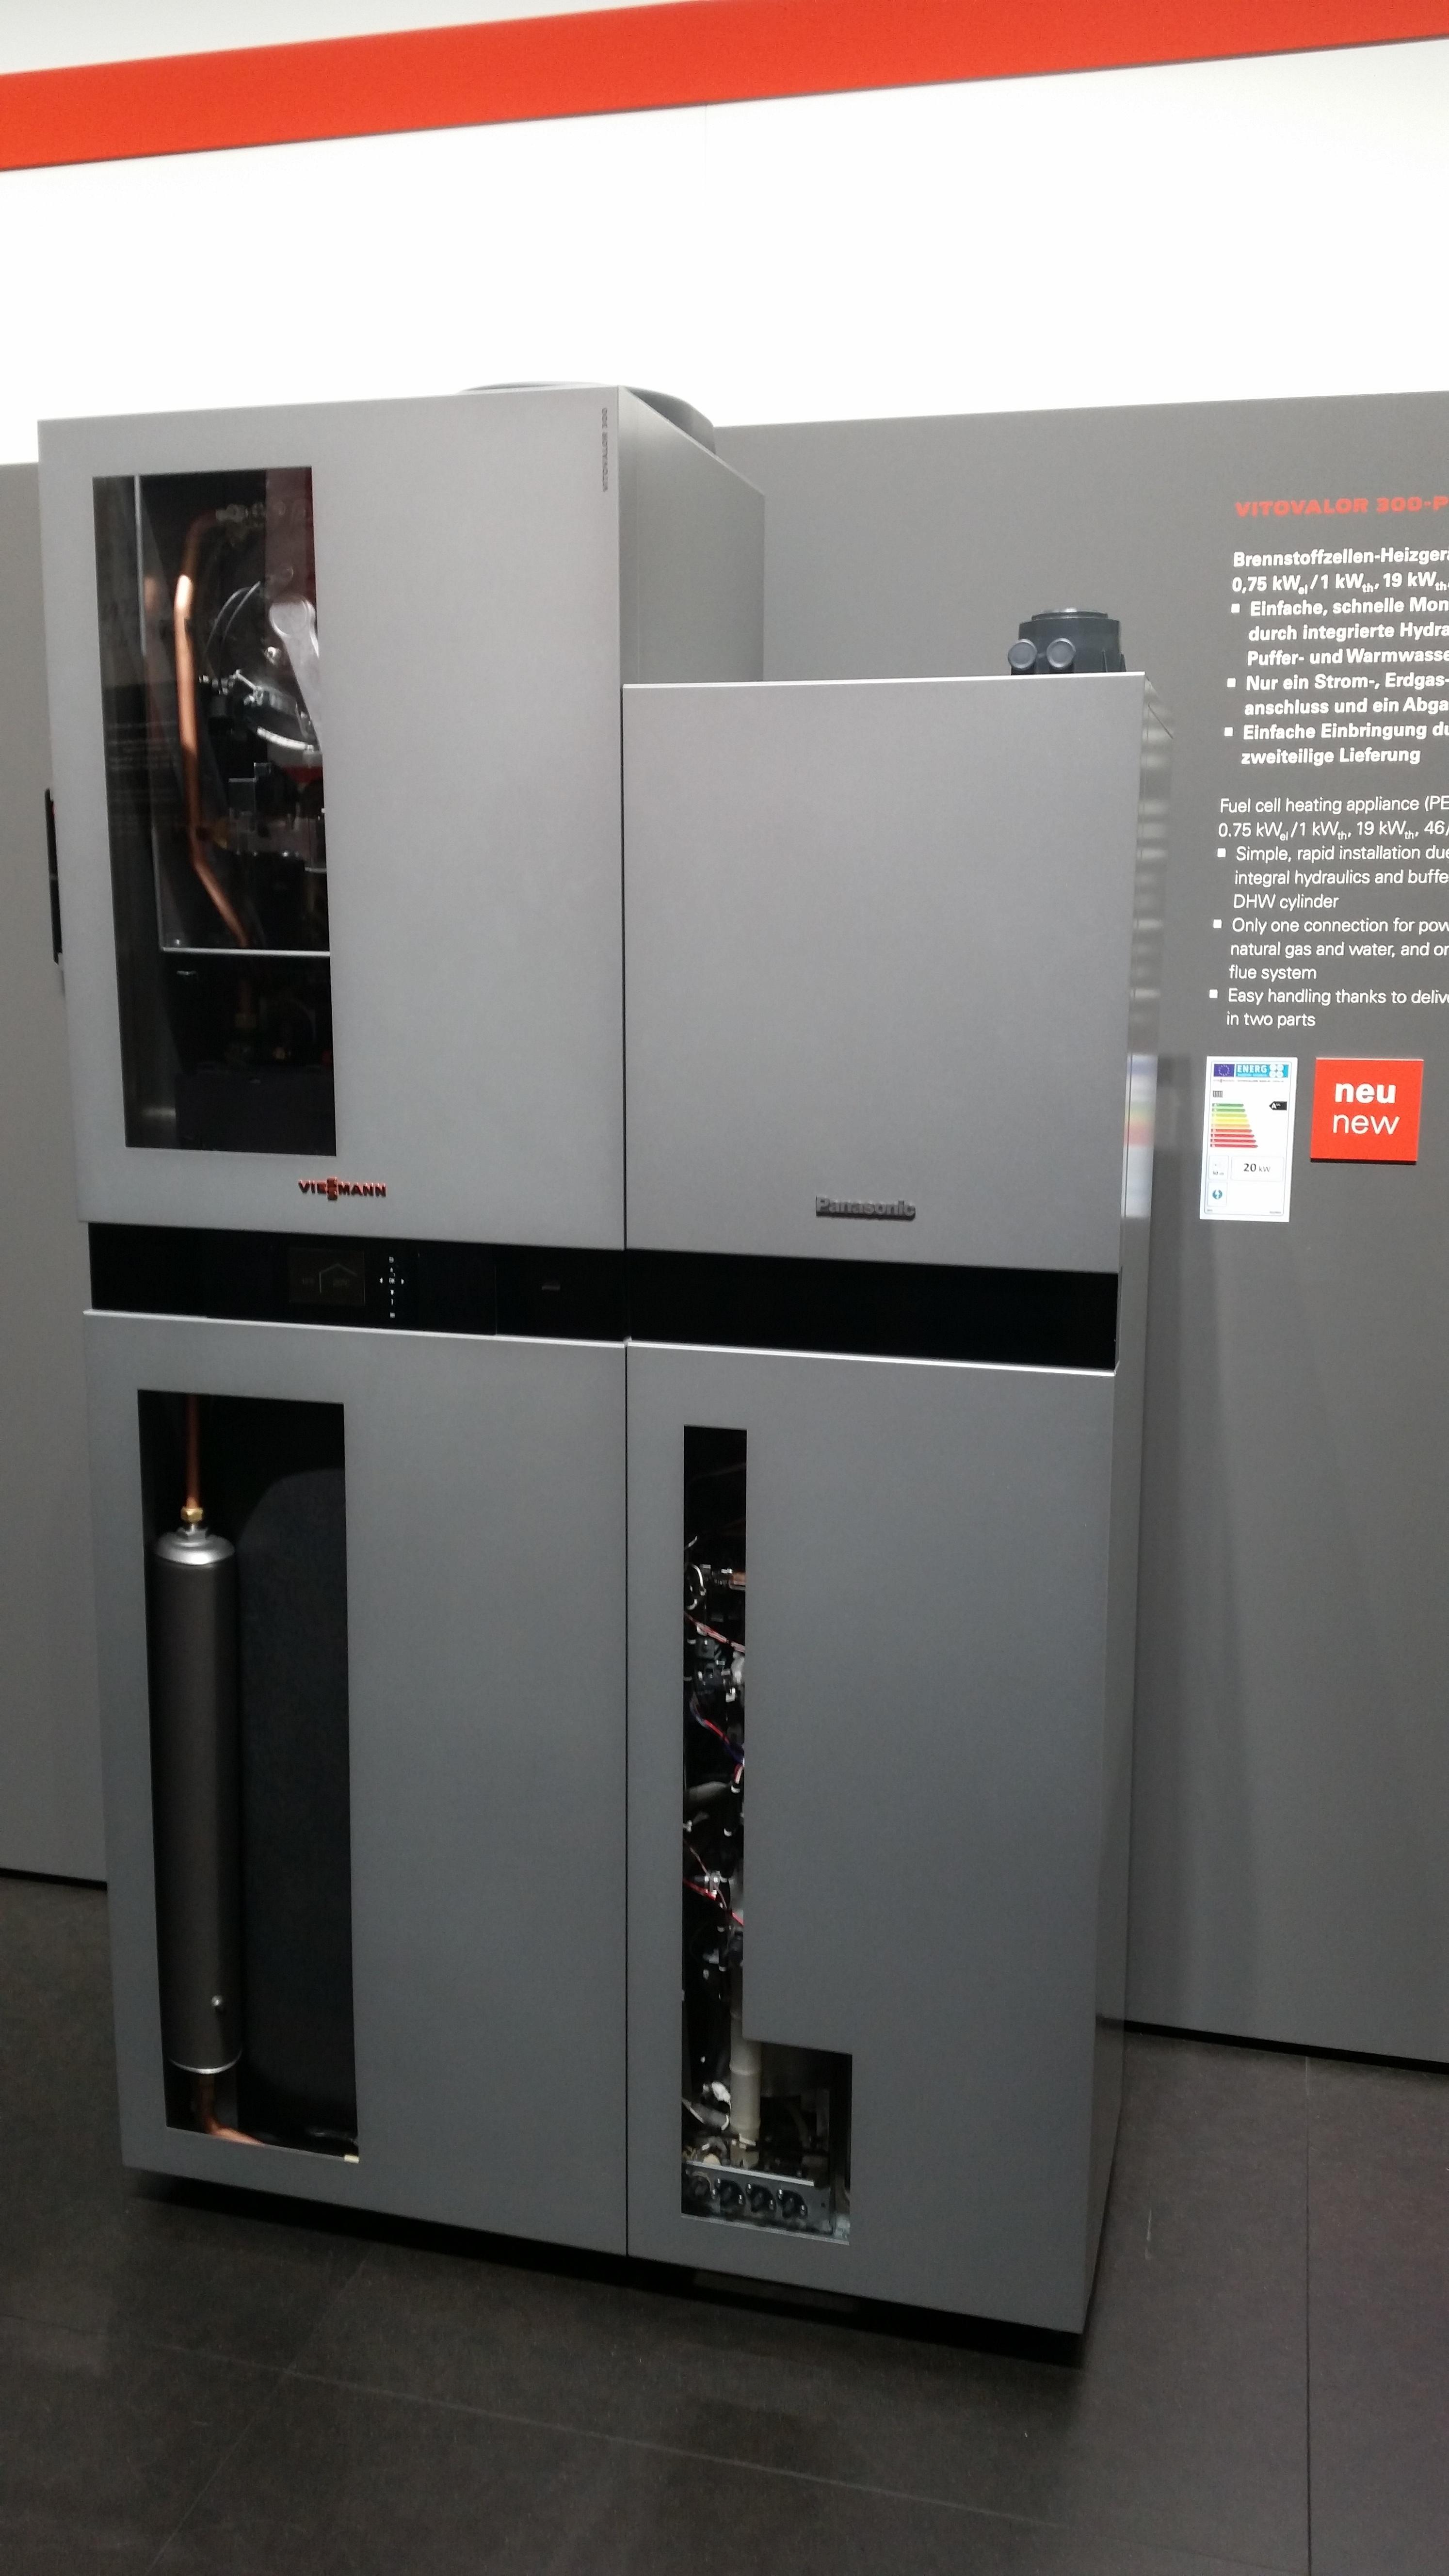 Vitovalor 300-P